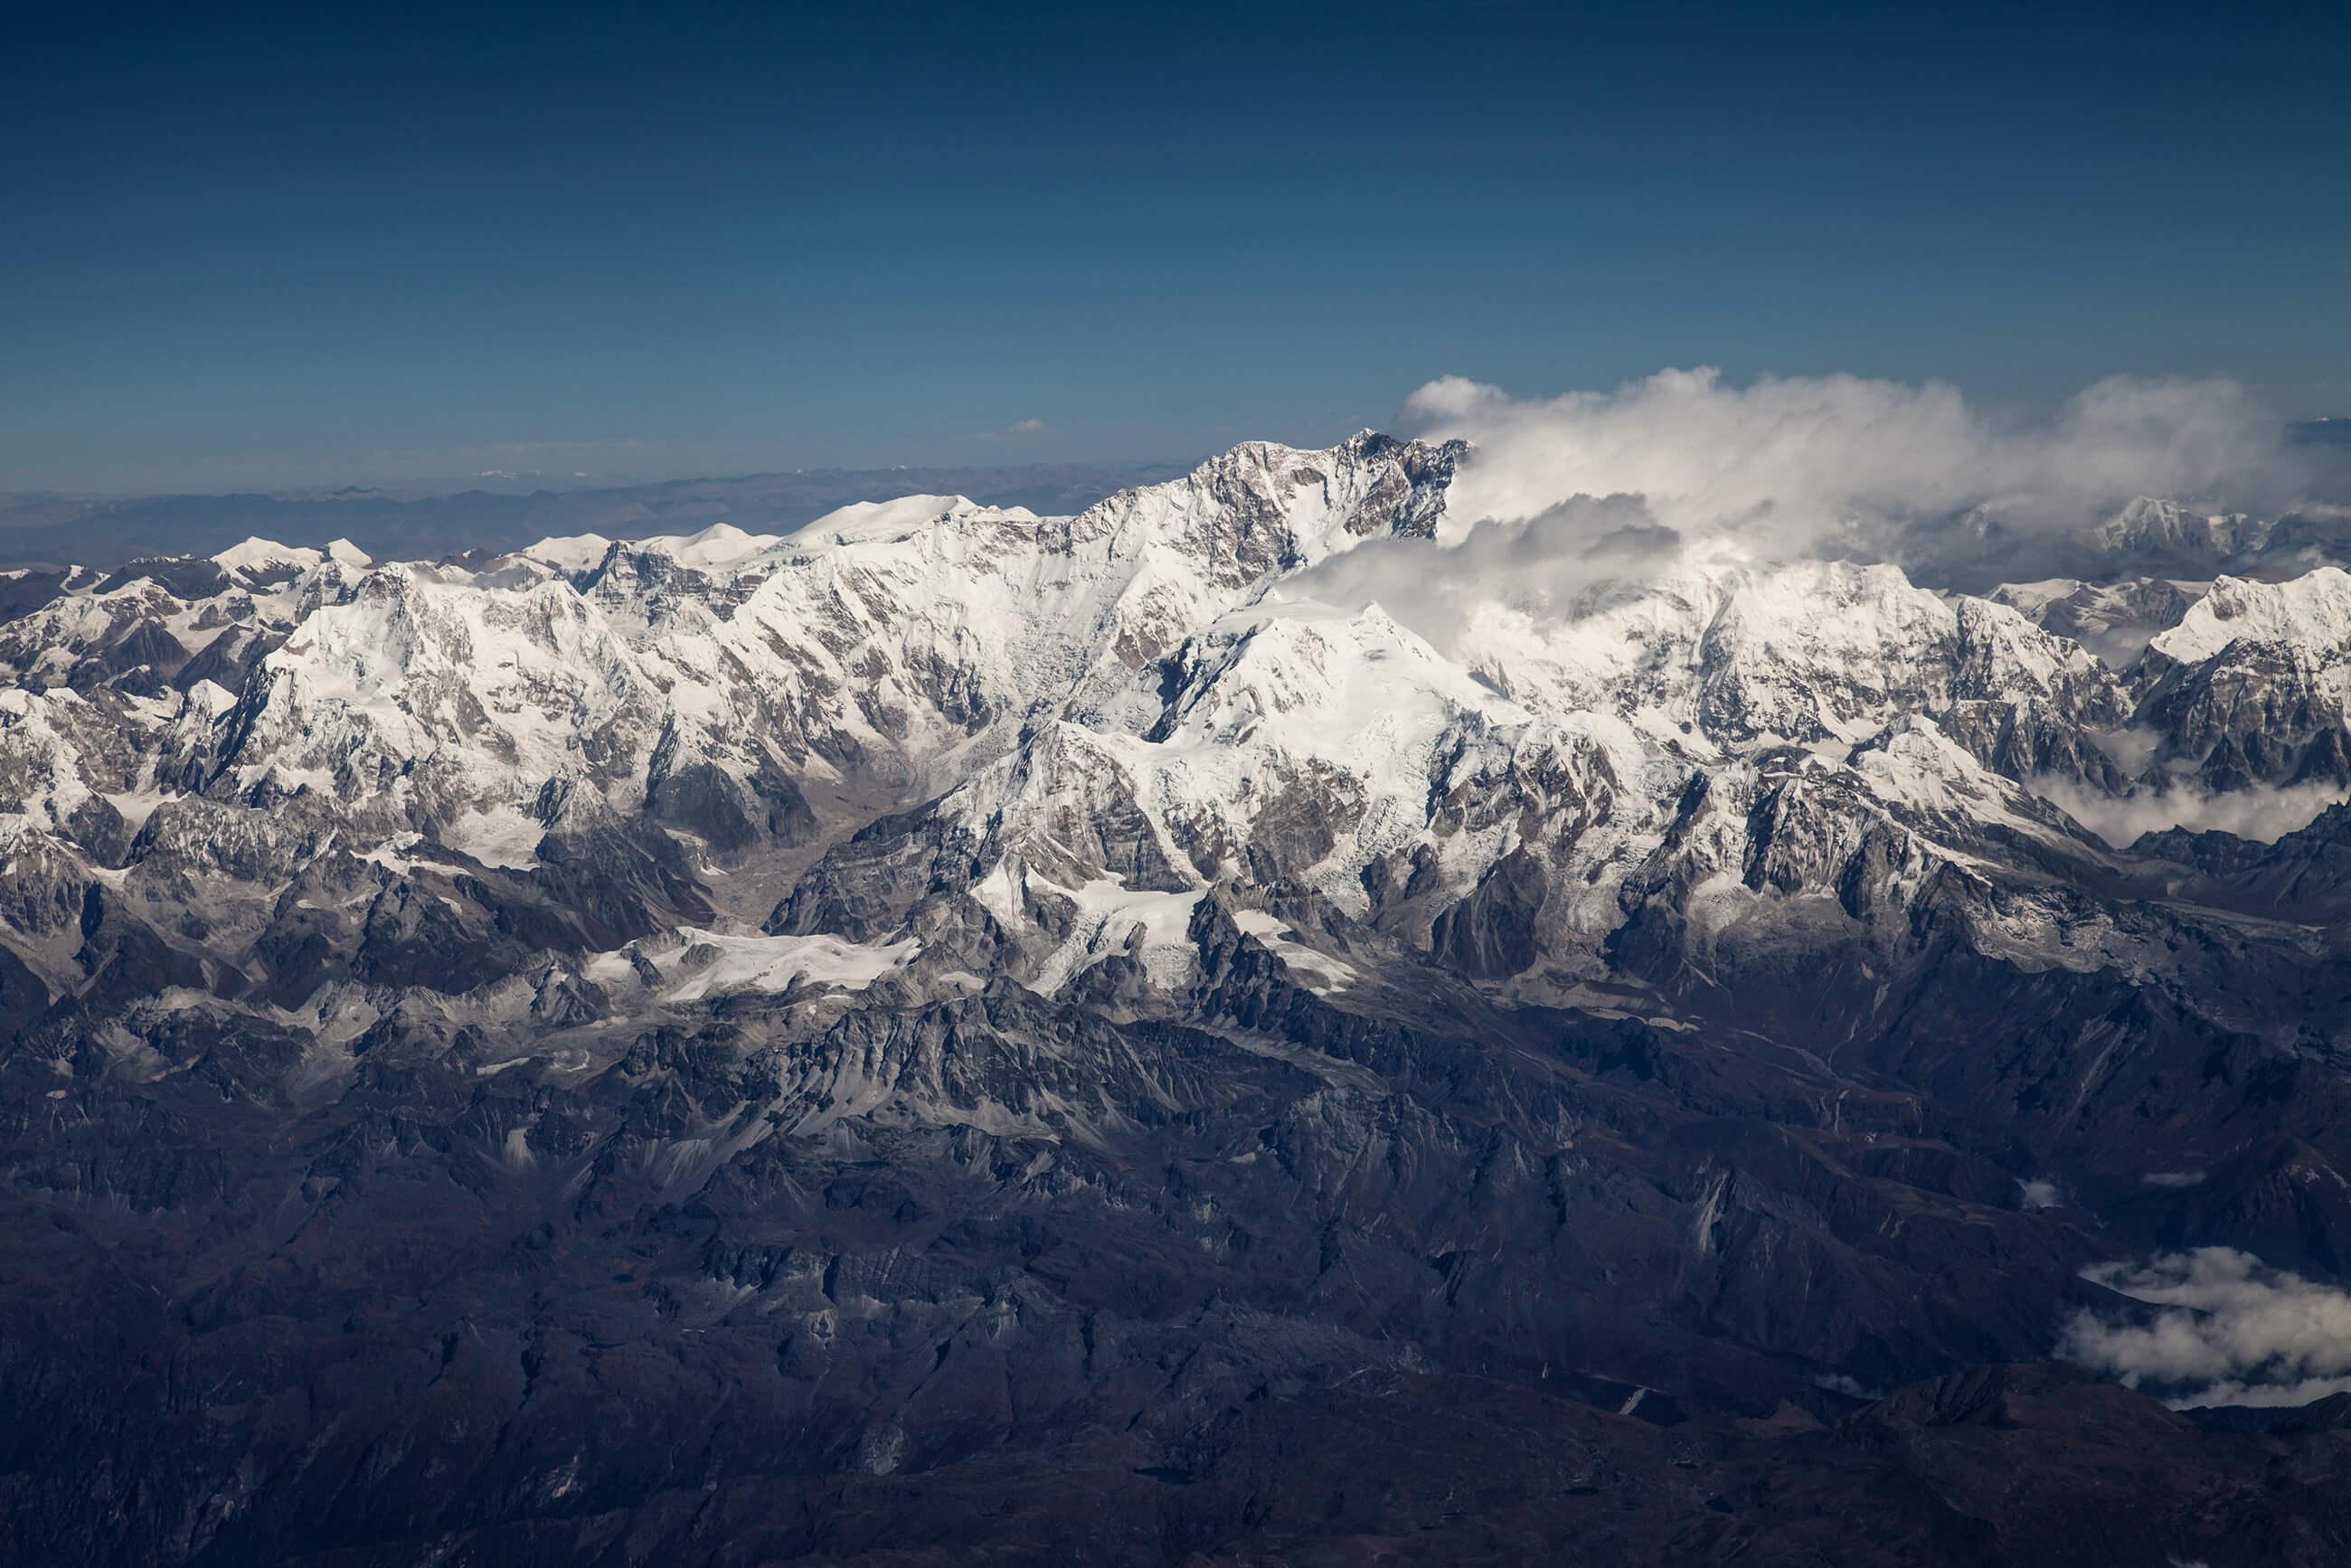 https://bubo.sk/uploads/galleries/4914/samuelklc_nepal_himalaje_img_0008-1.jpg